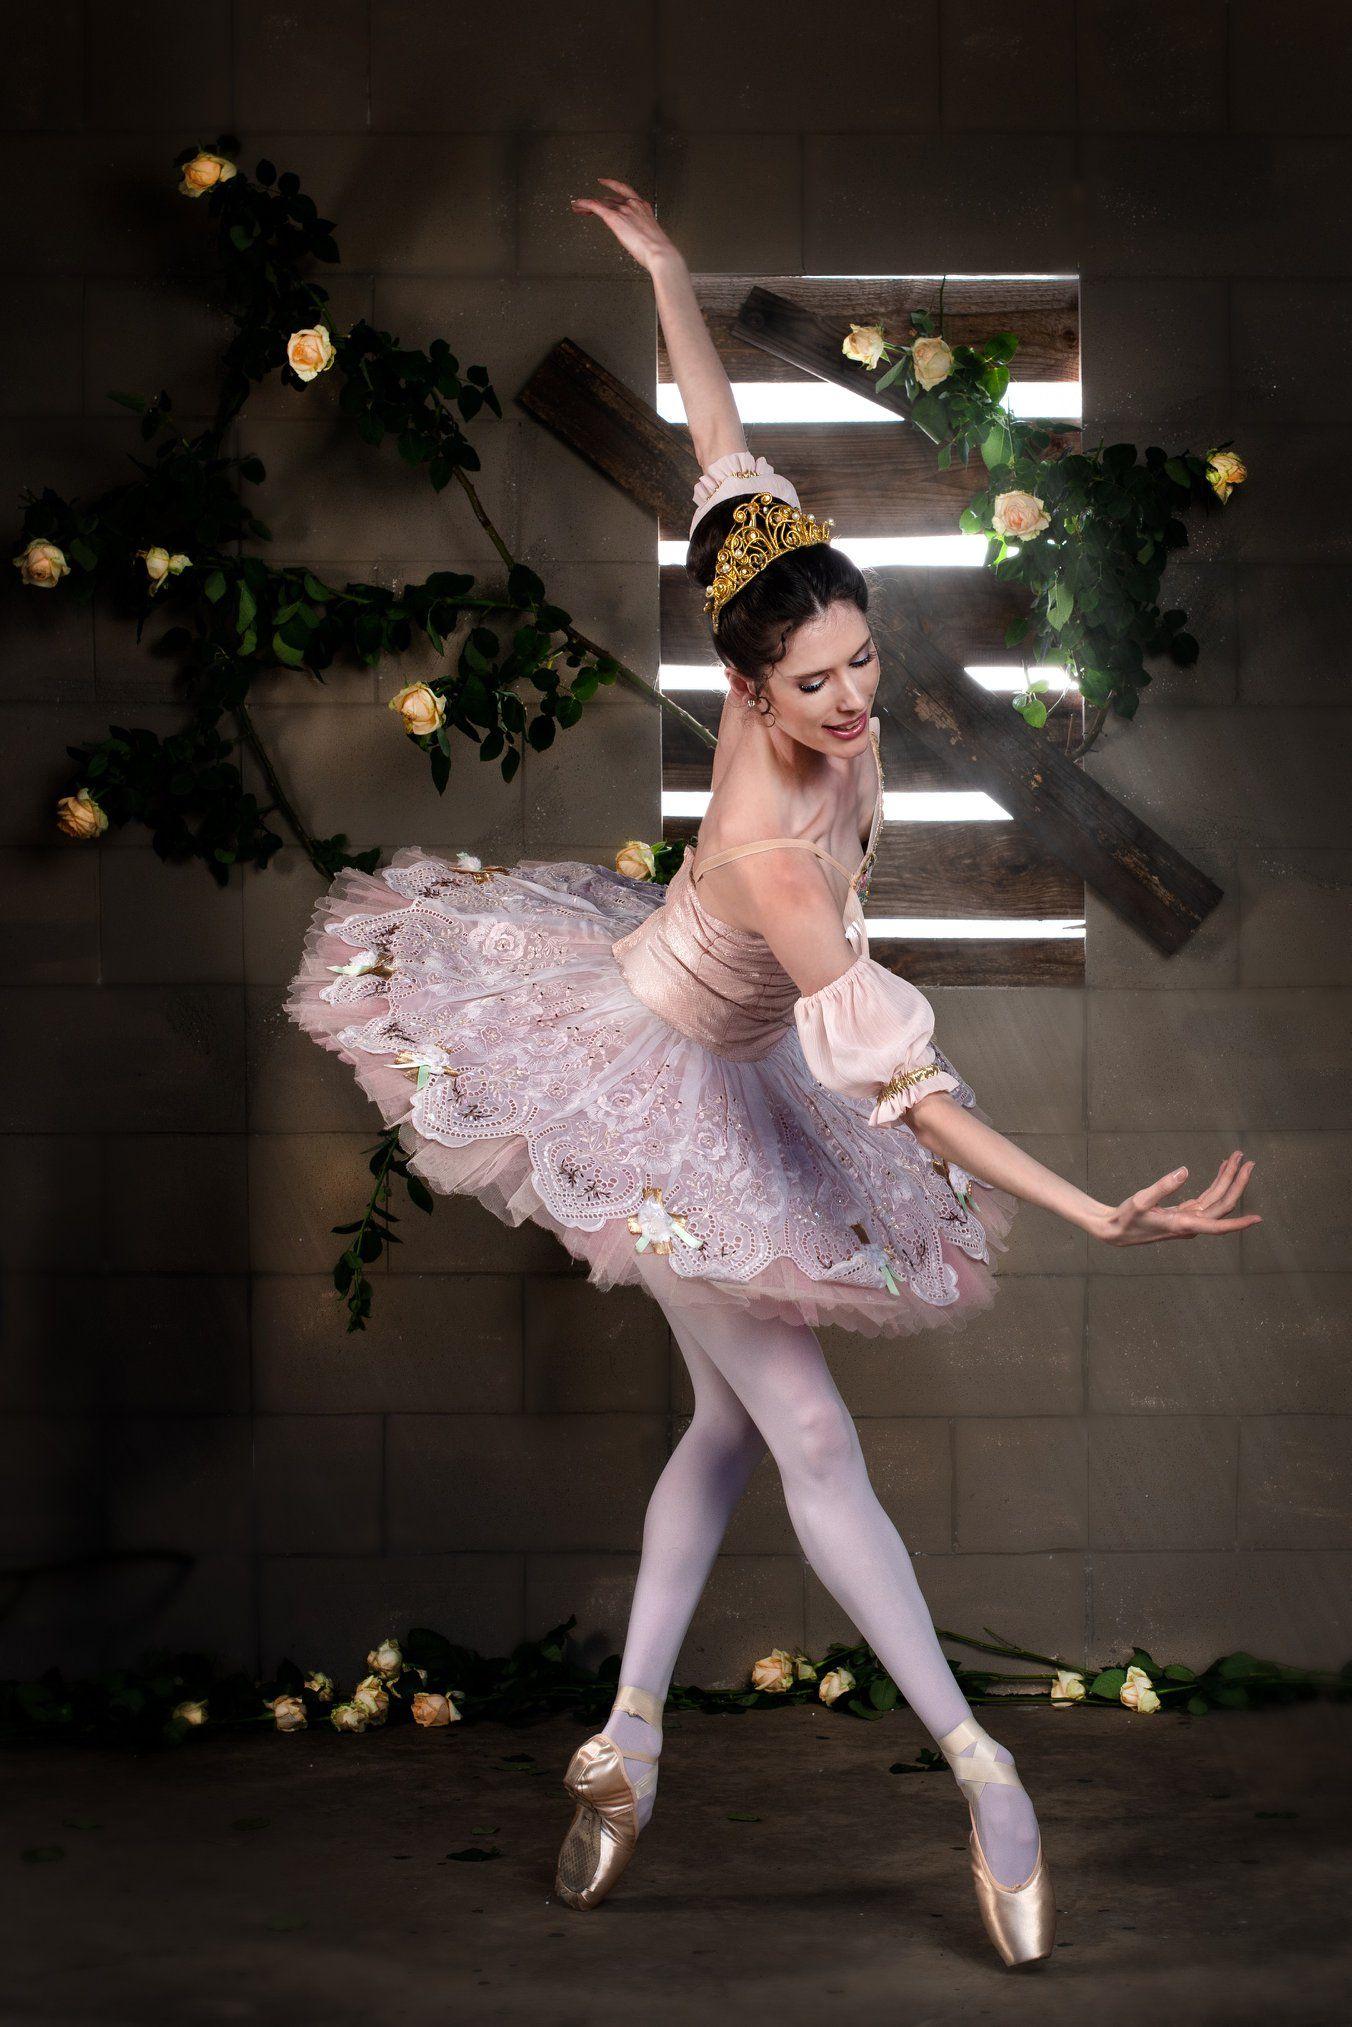 joburg ballet principal dancer nicole ferreira dill as princess aurora from the sleeping beauty photo ballet dance photography ballet images ballet beauty